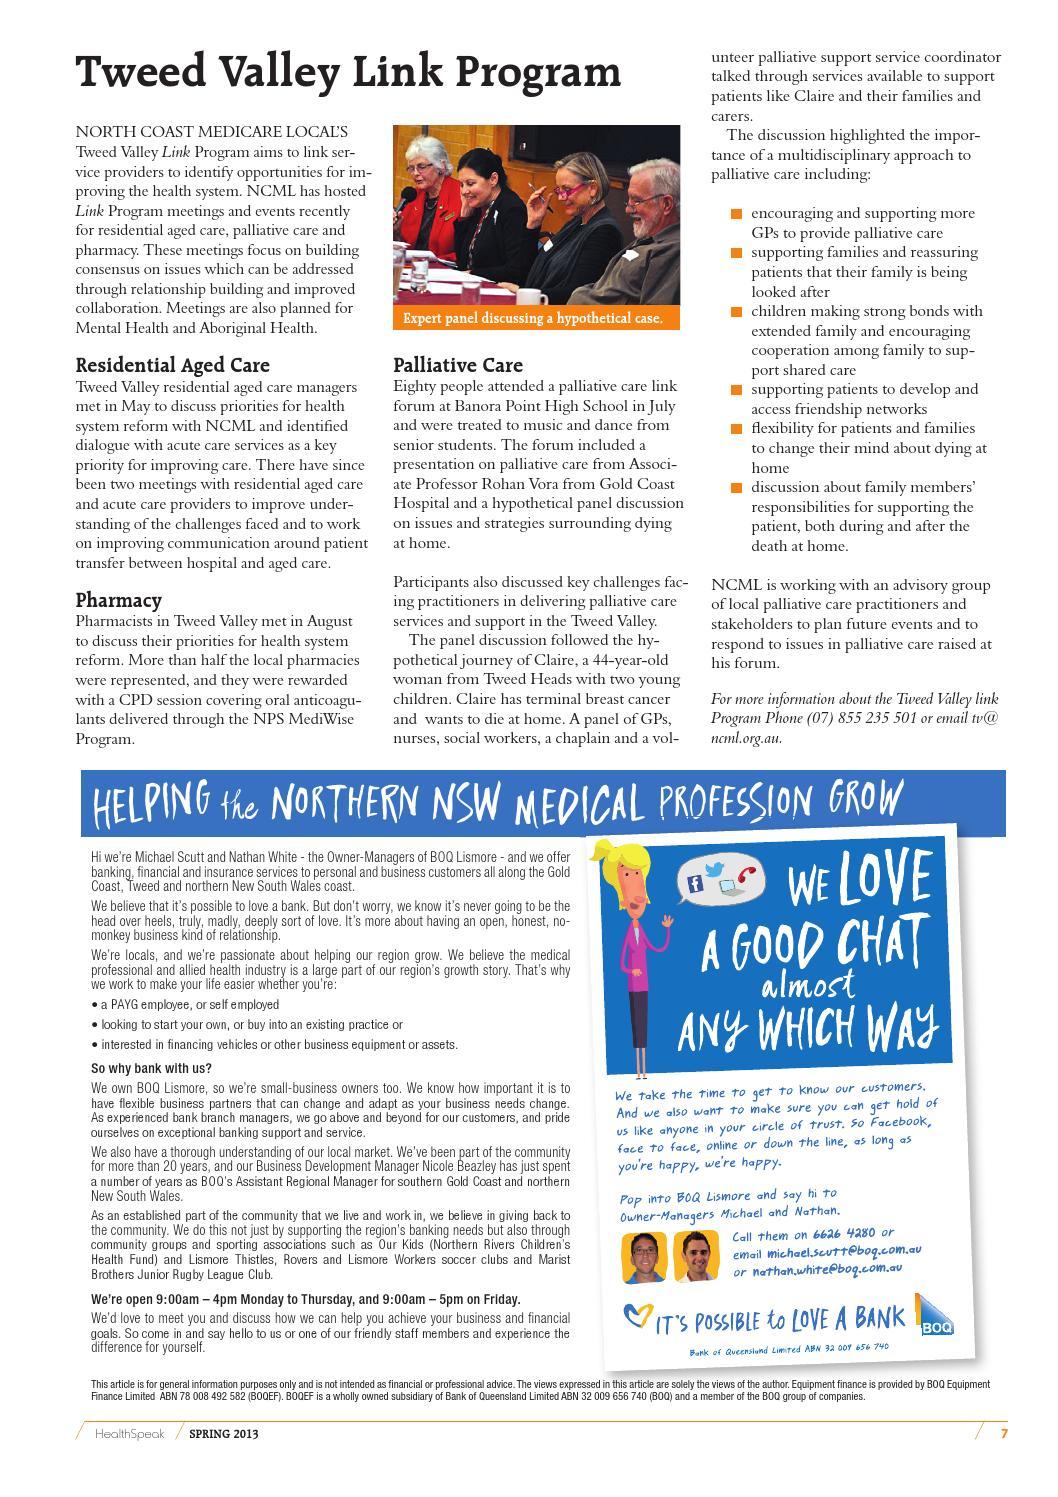 HealthSpeak SPRING 2013 by North Coast Primary Health